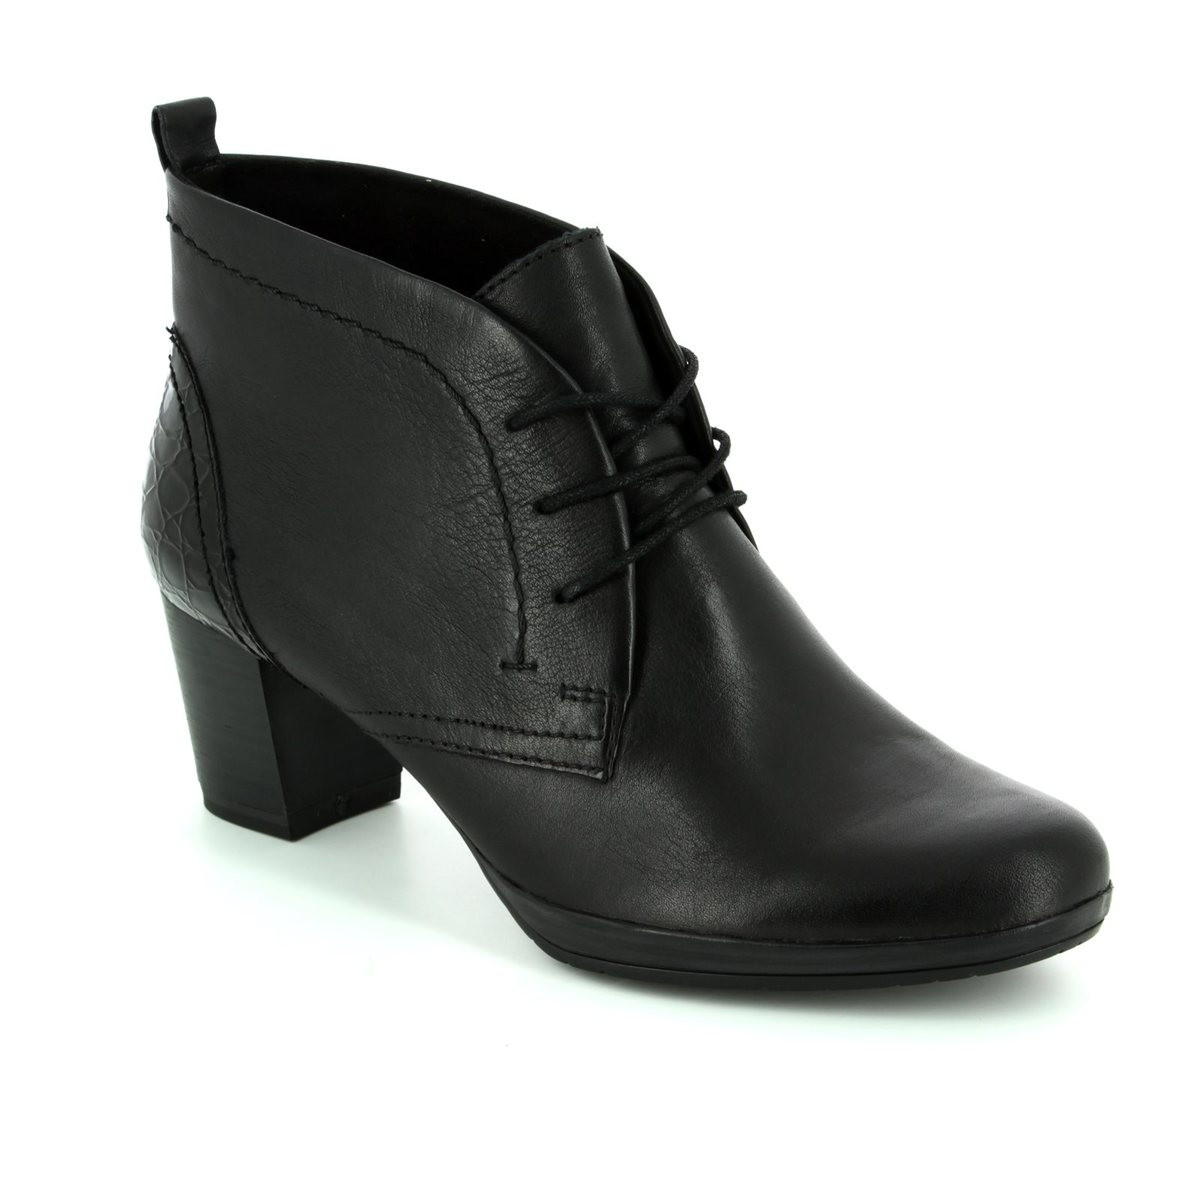 25340, Womens Chelsea Boots Marco Tozzi